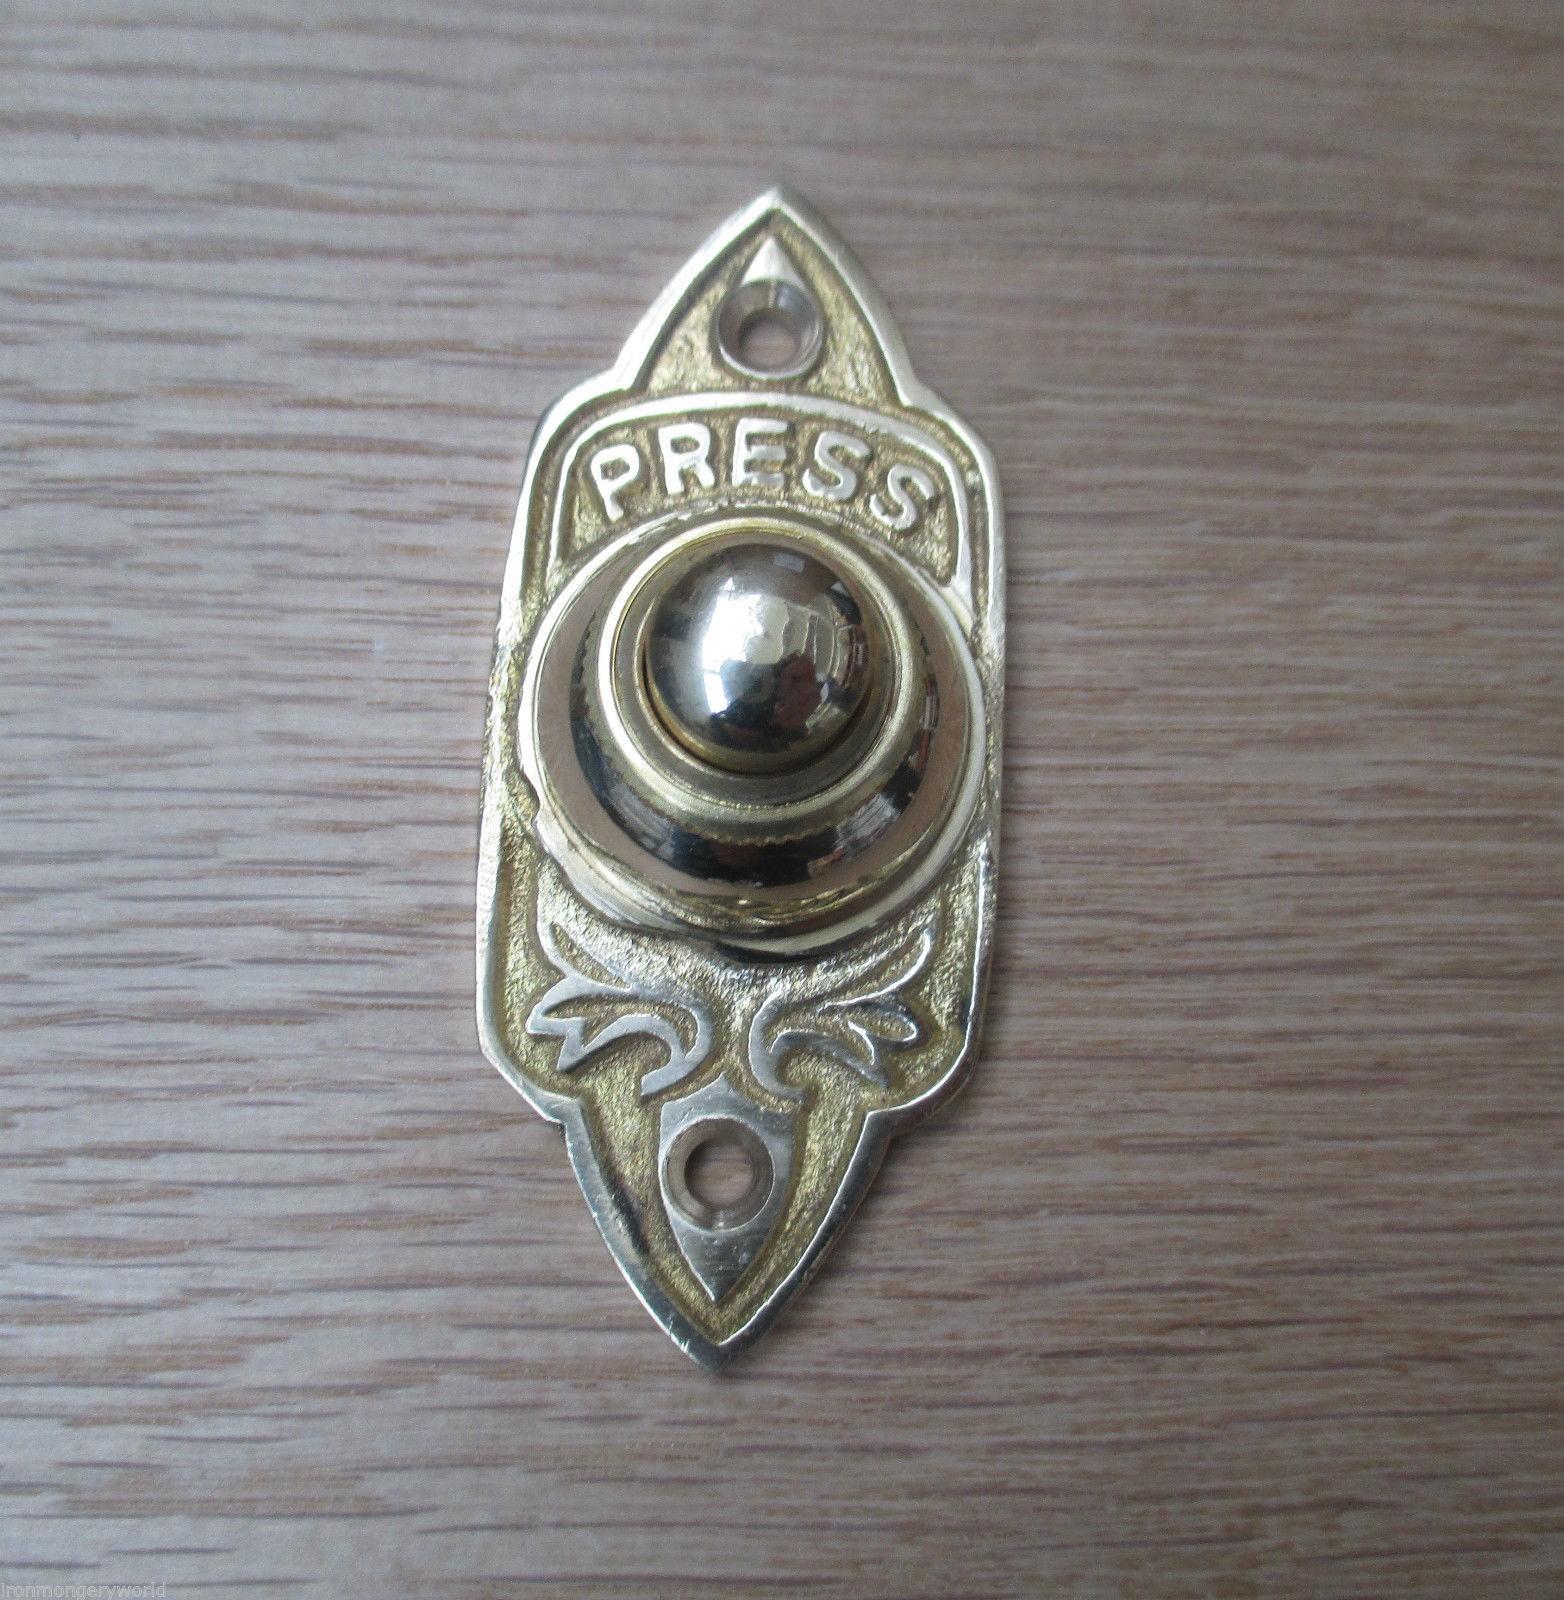 Edwardian Door Bell Amp Decorative Victorian Style Brass